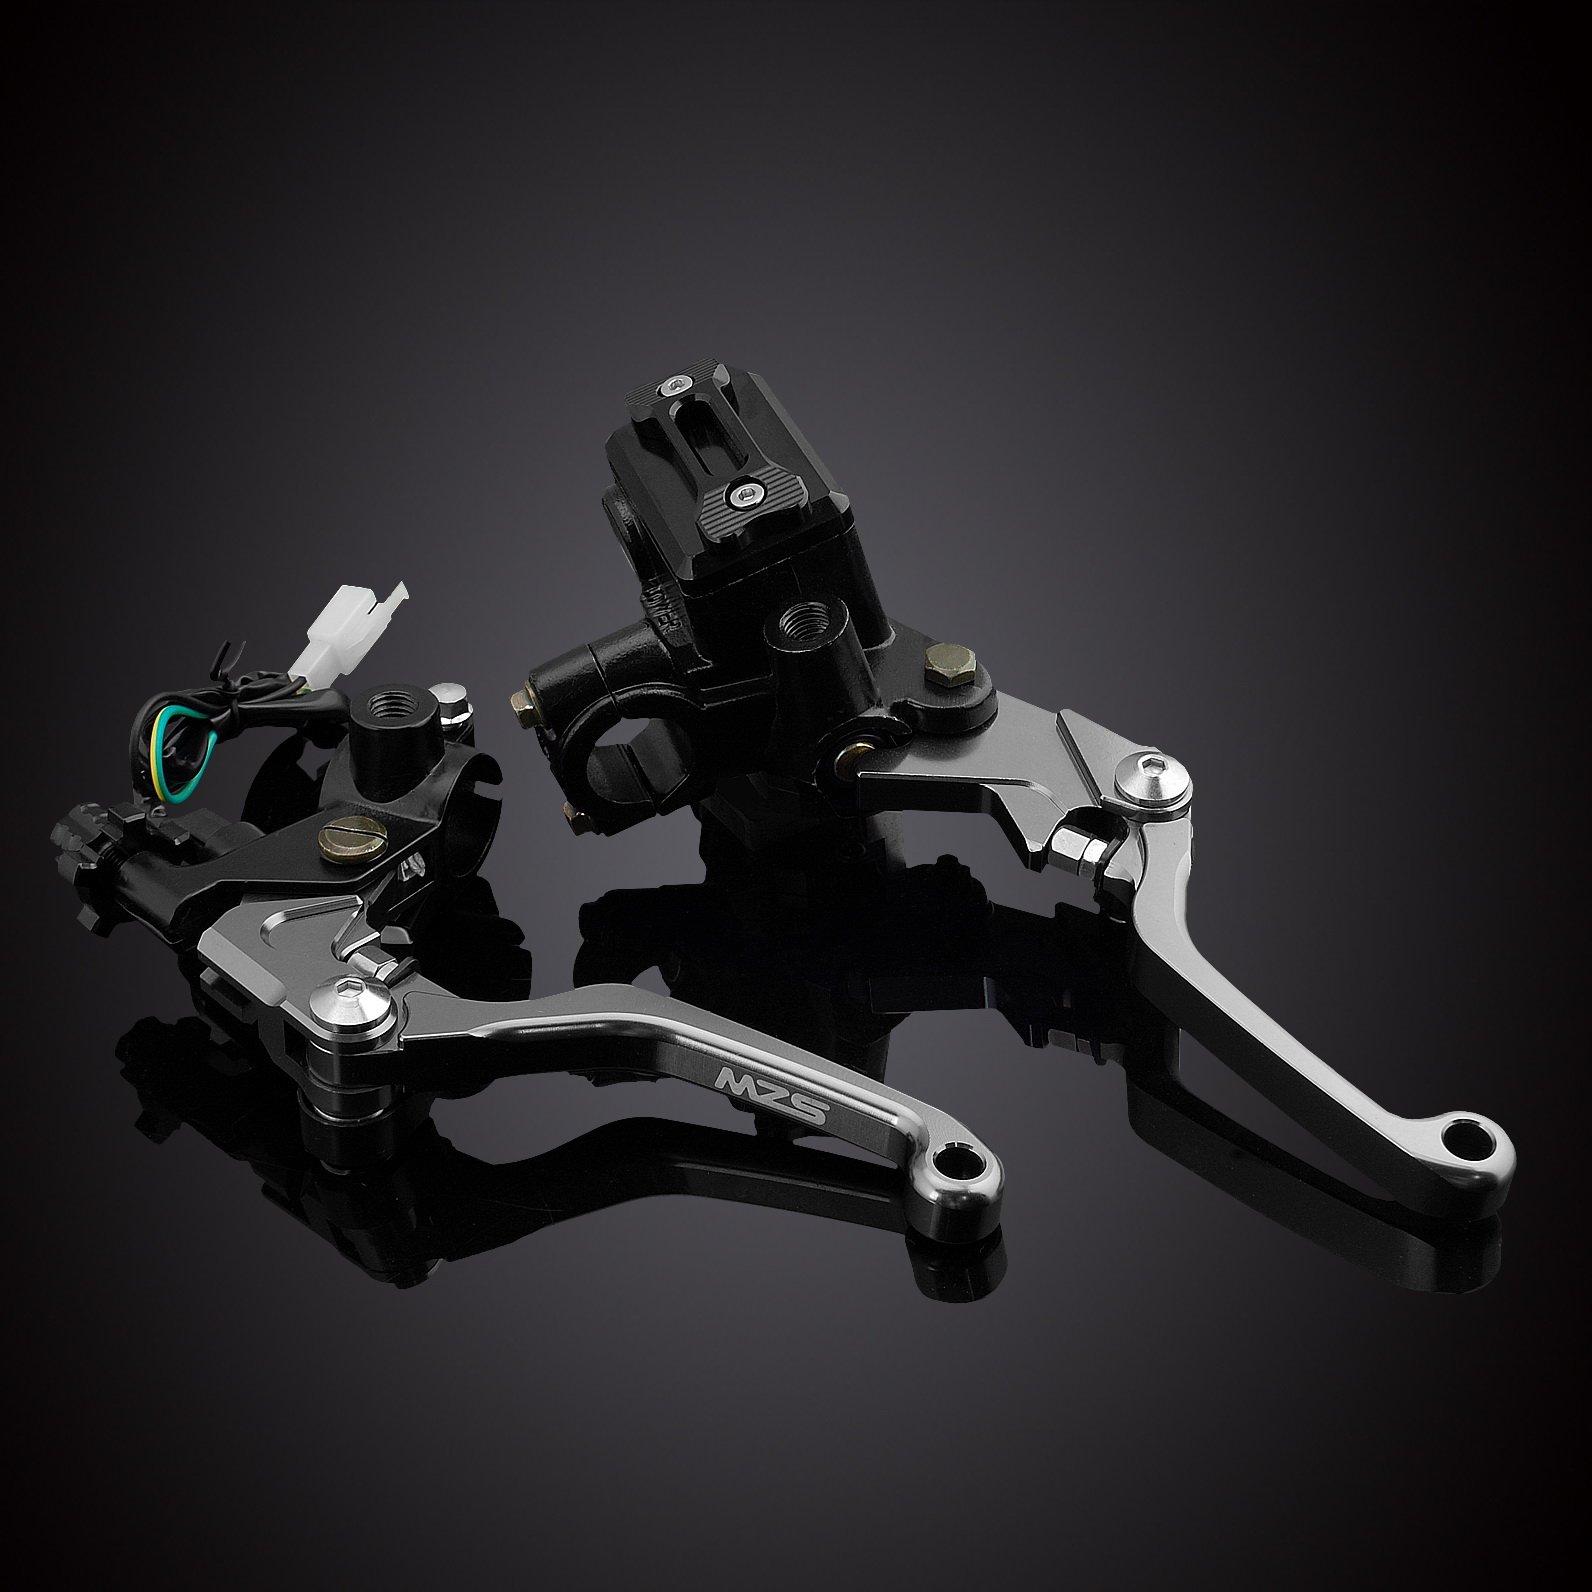 MZS 7/8 Brake Master Cylinder Reservoir Pivot Levers Set for Honda Yamaha Suzuki Kawasaki KTM (Gray) by MZS (Image #2)